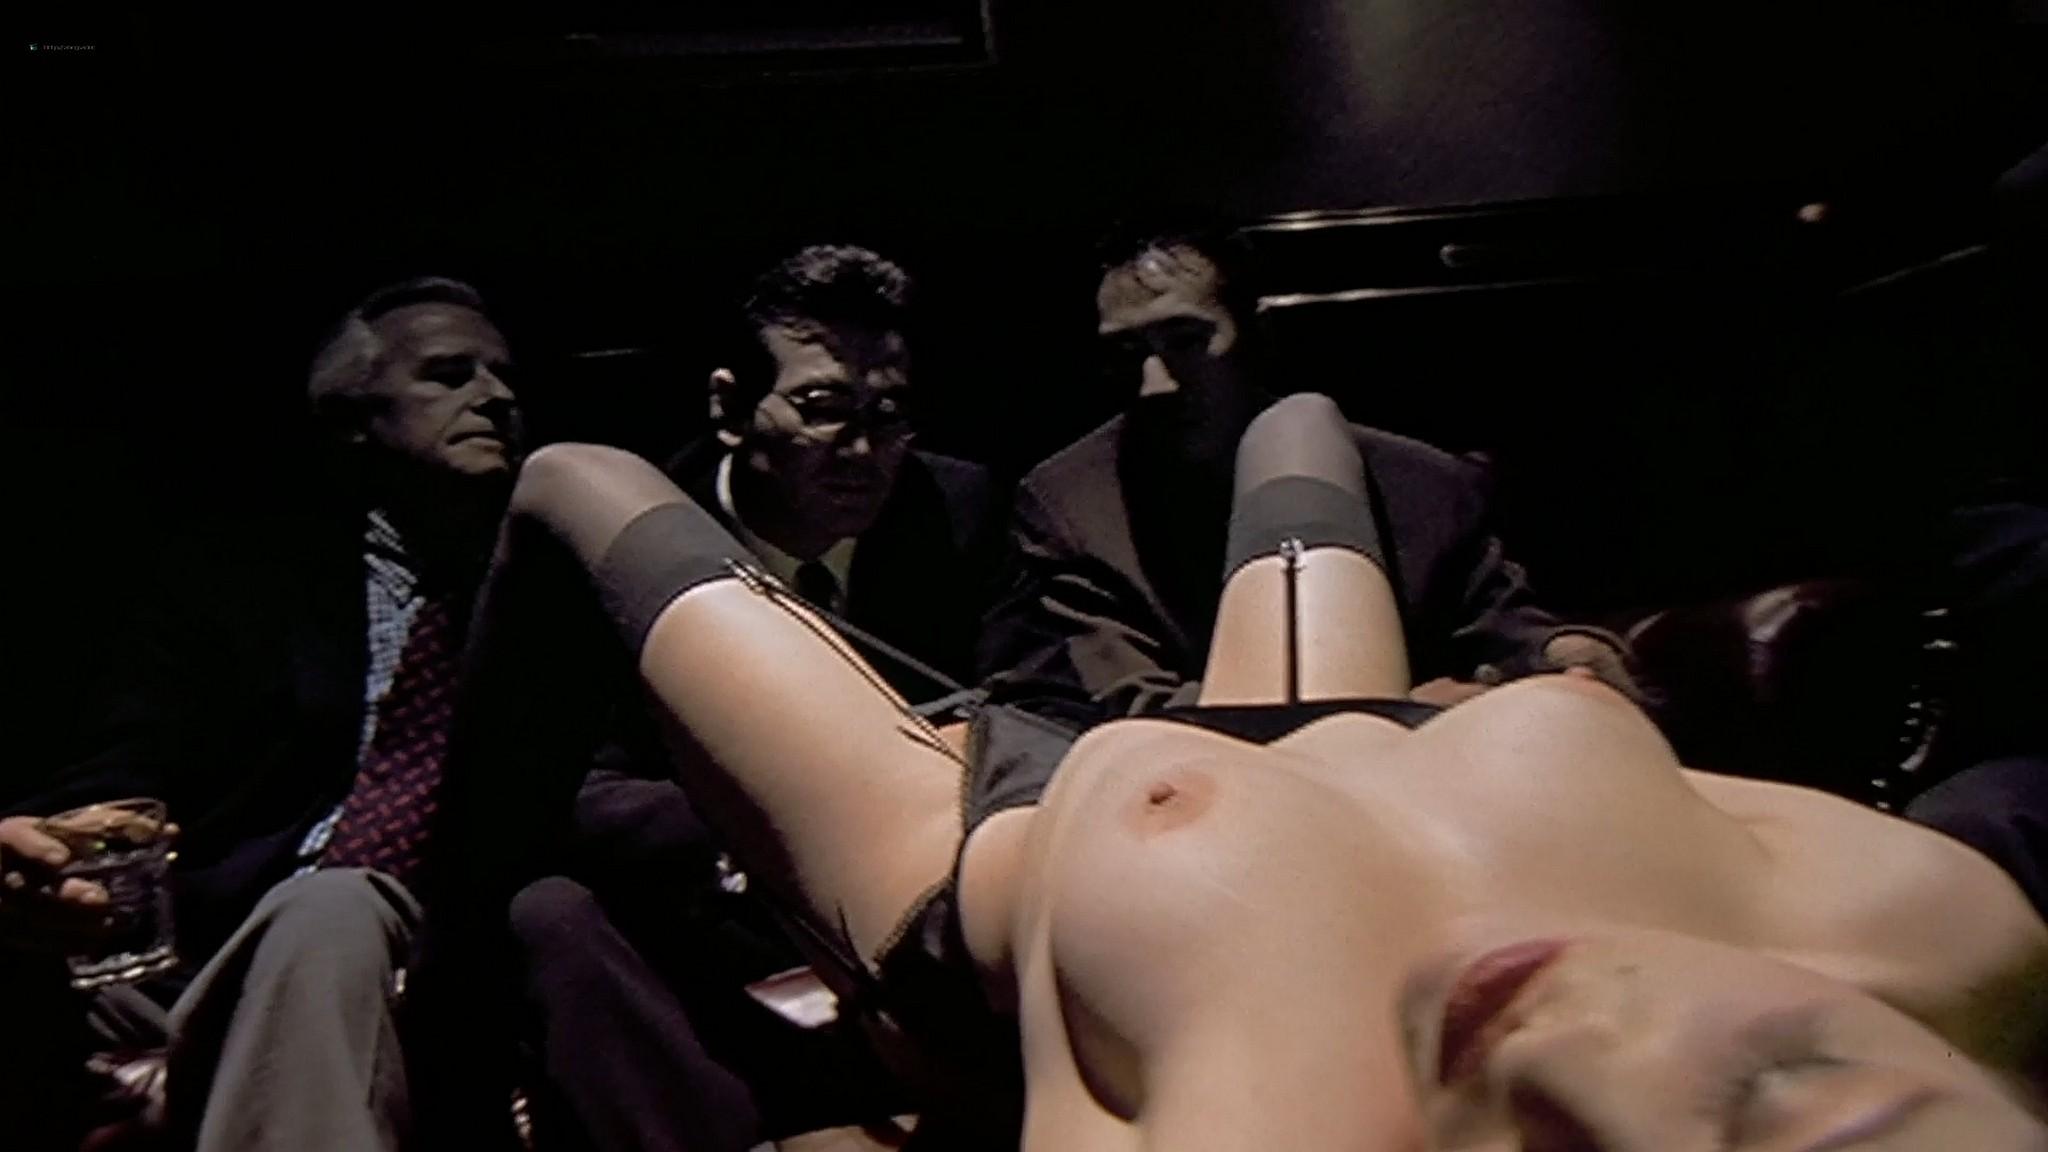 Molly Parker nude sex Alisha Klass explicit Carla Gugino sexy The Center of the World 2001 1080p